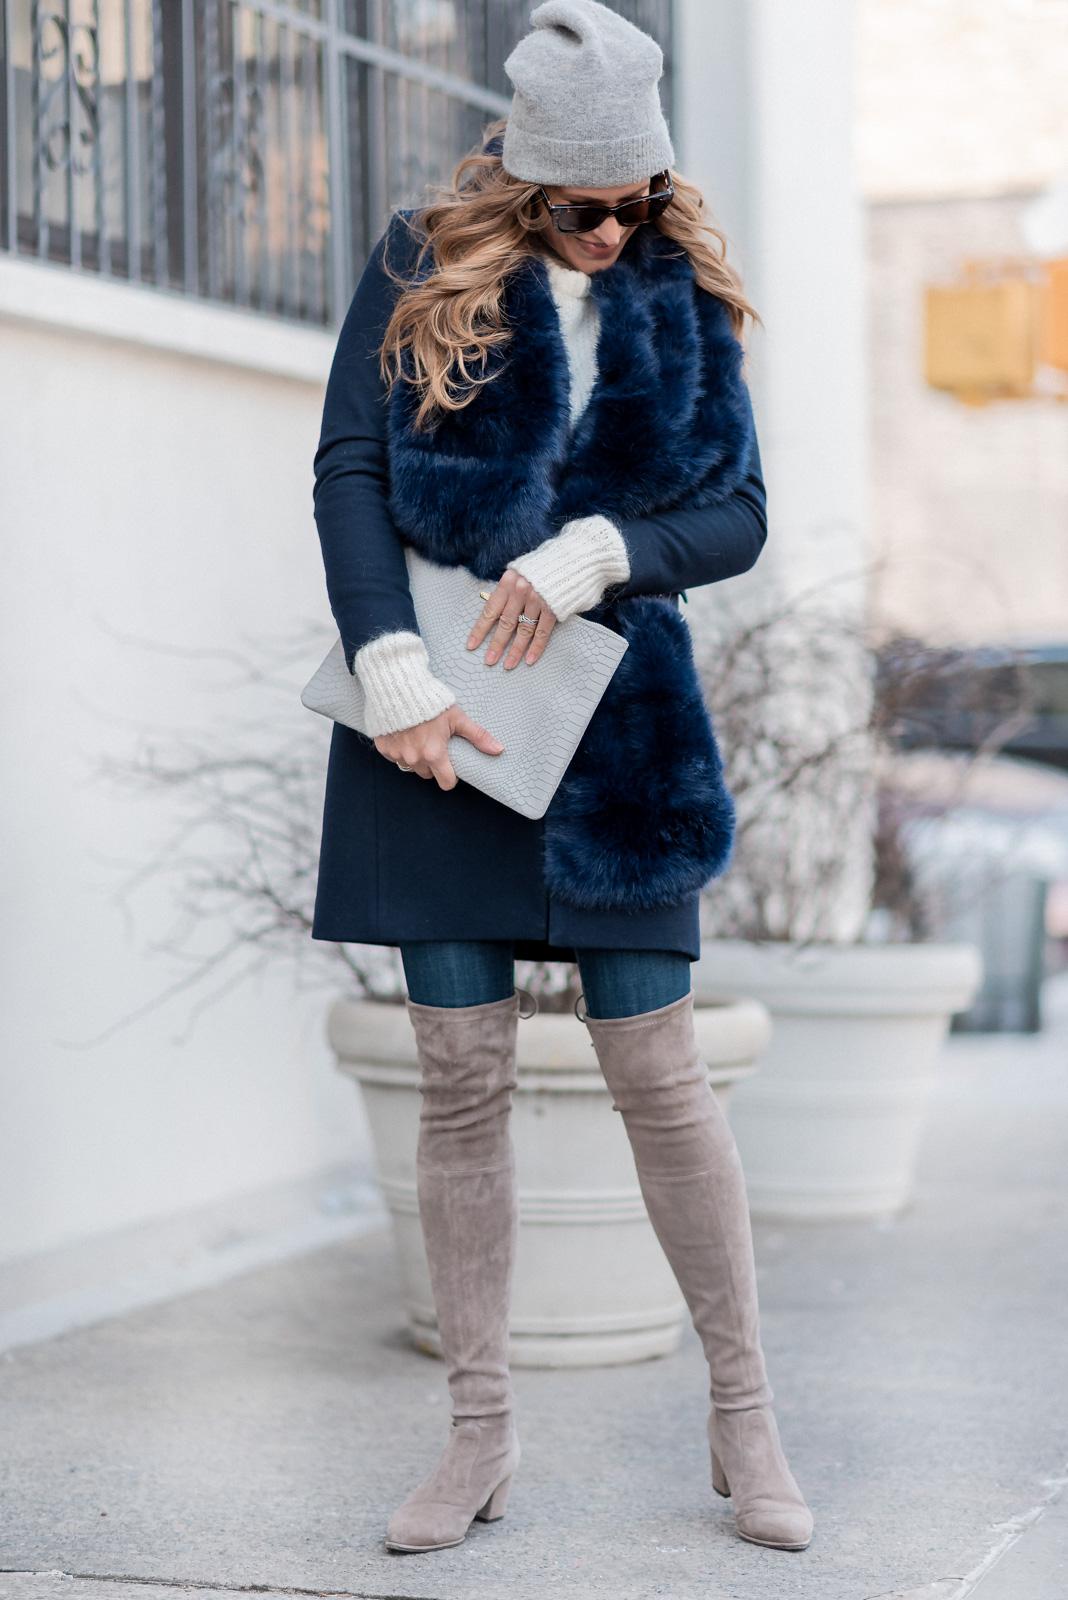 Laura Behnke Shop Your Closet No Buy February